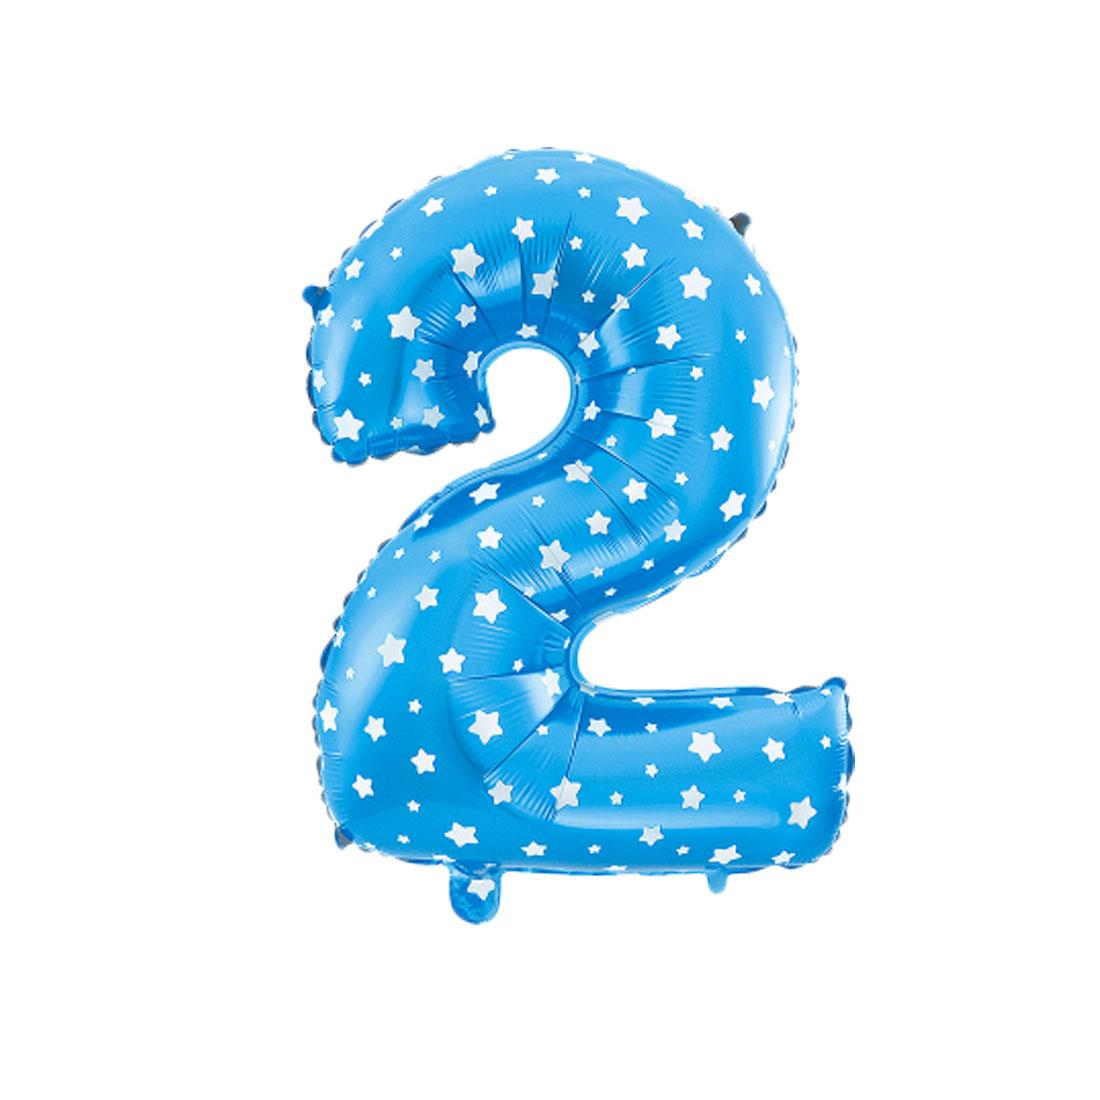 "Unique Bargains 16"" Blue Foil Number 2 Shape Balloon Helium Birthday Wedding Decor"